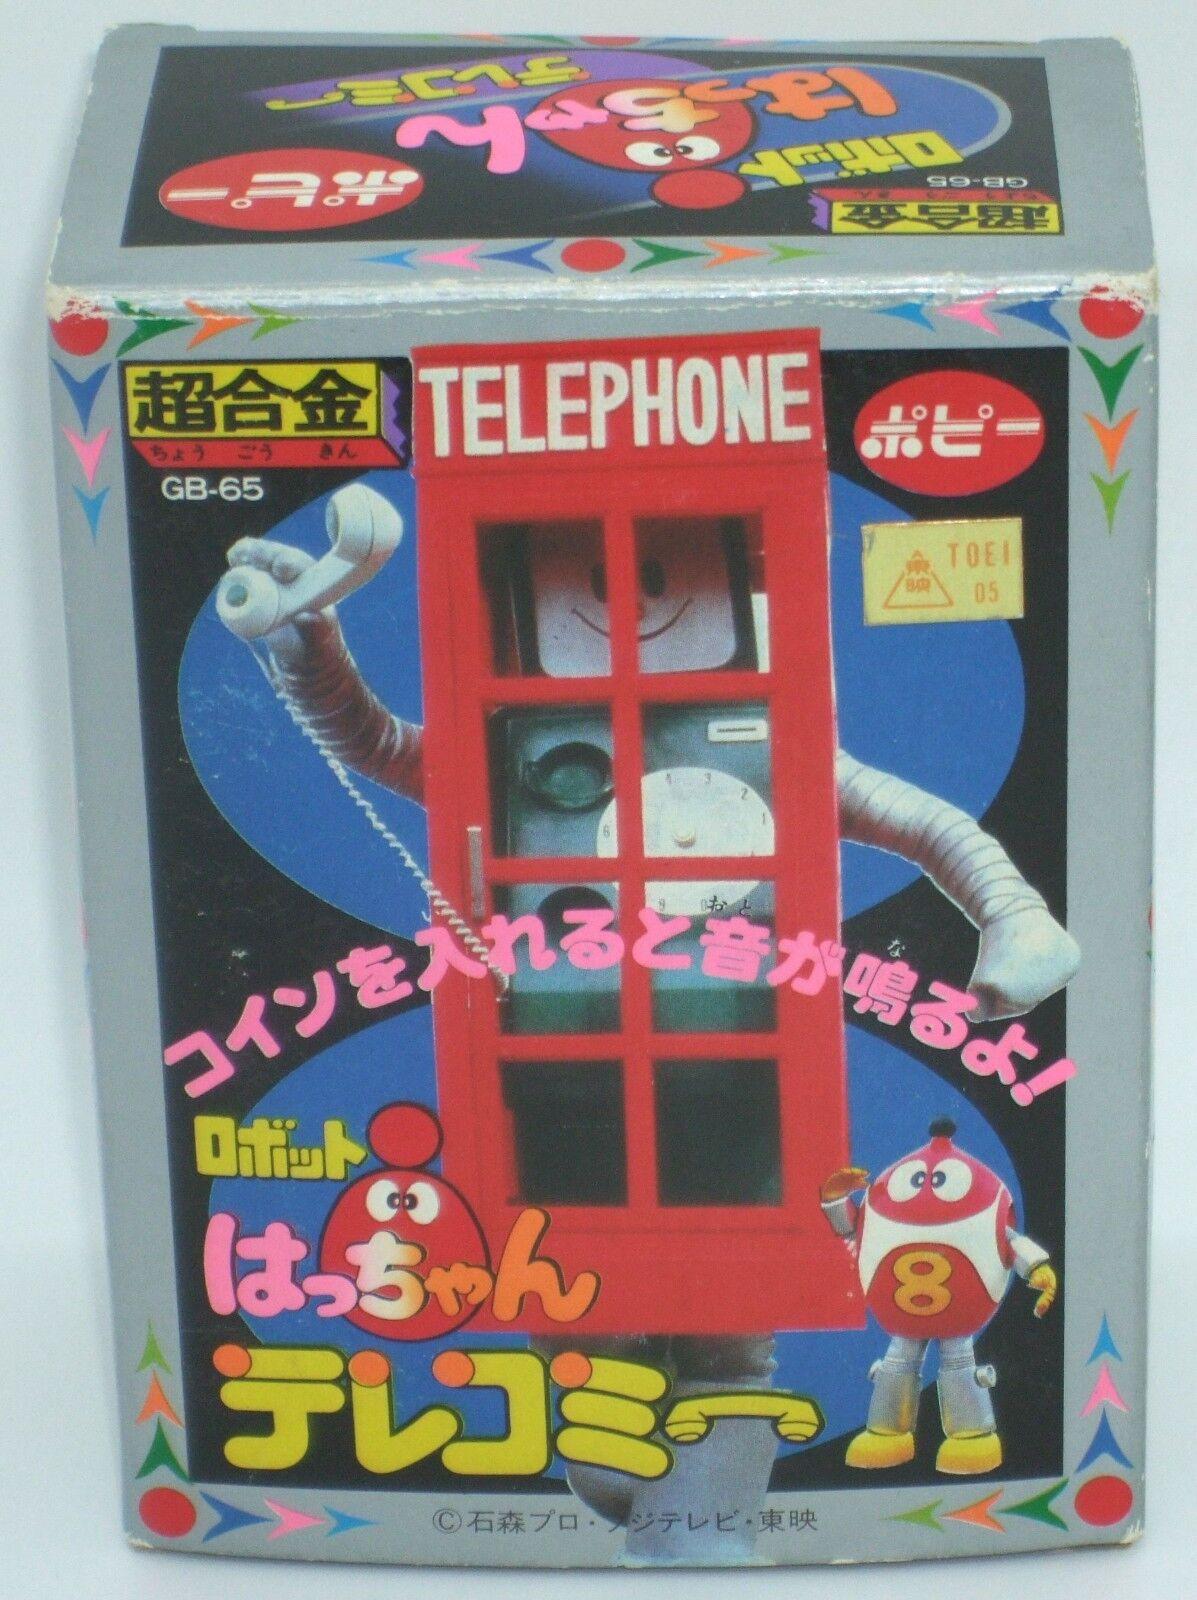 Robot 8-Chan Telephone Telemi Chogokin GB-65 Figure Dolls 4.1